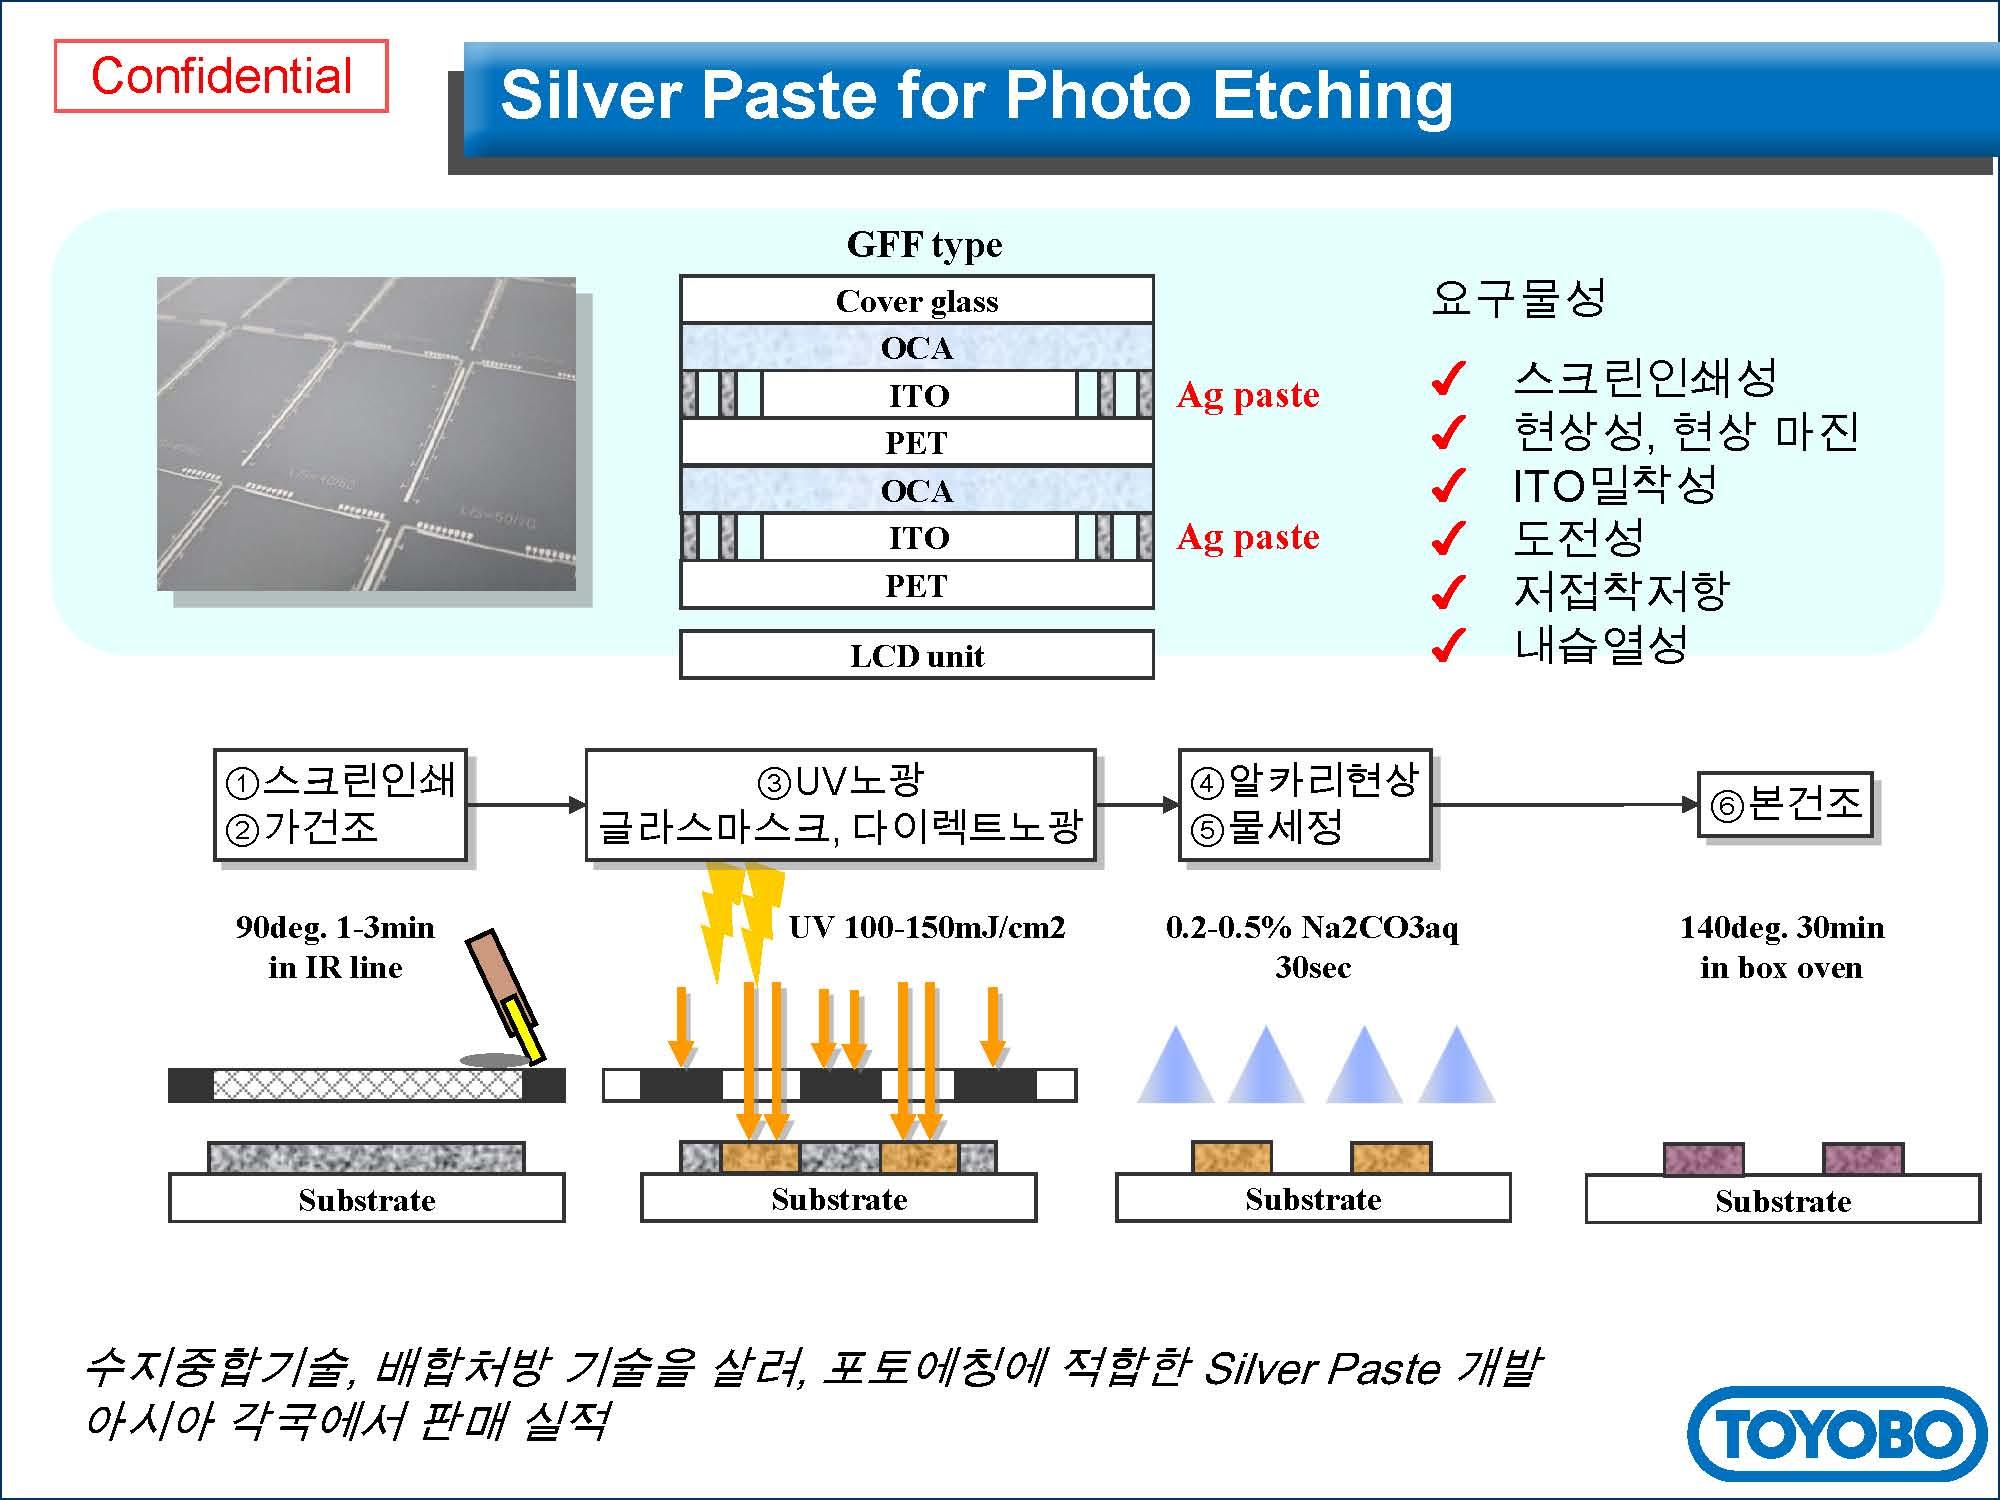 Vylon 소개자료(Silver Paste)_131217_Page_8.jpg